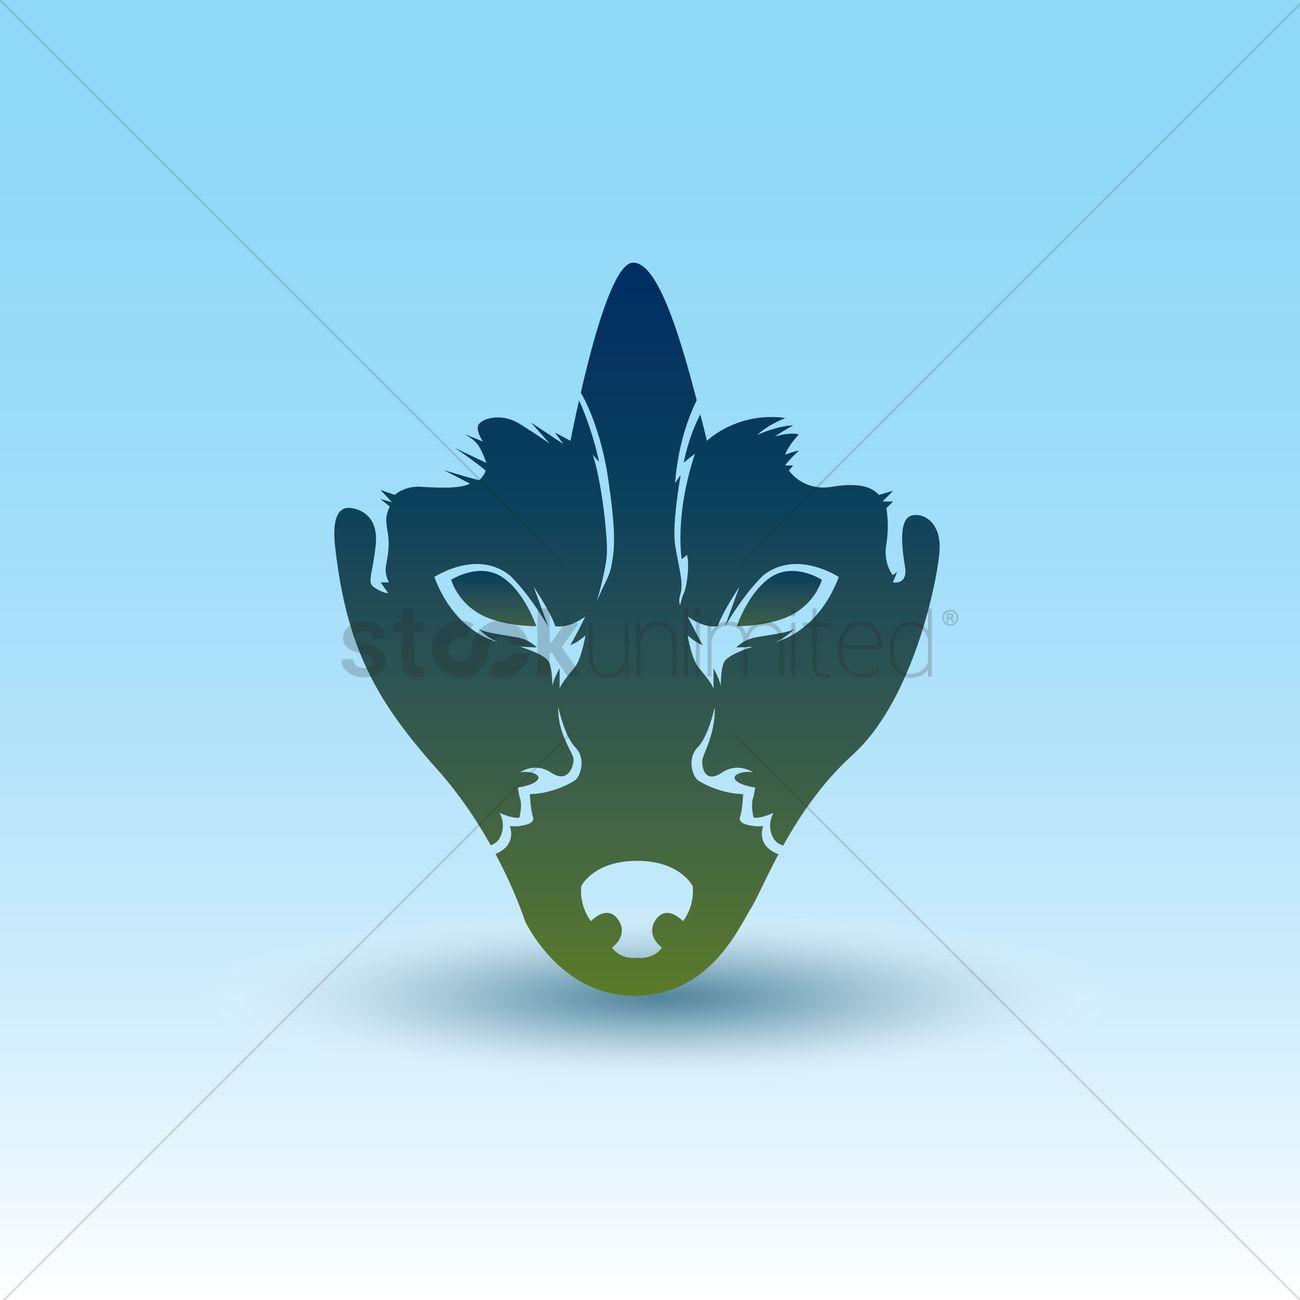 optical human illusion dog face vector stockunlimited illustration